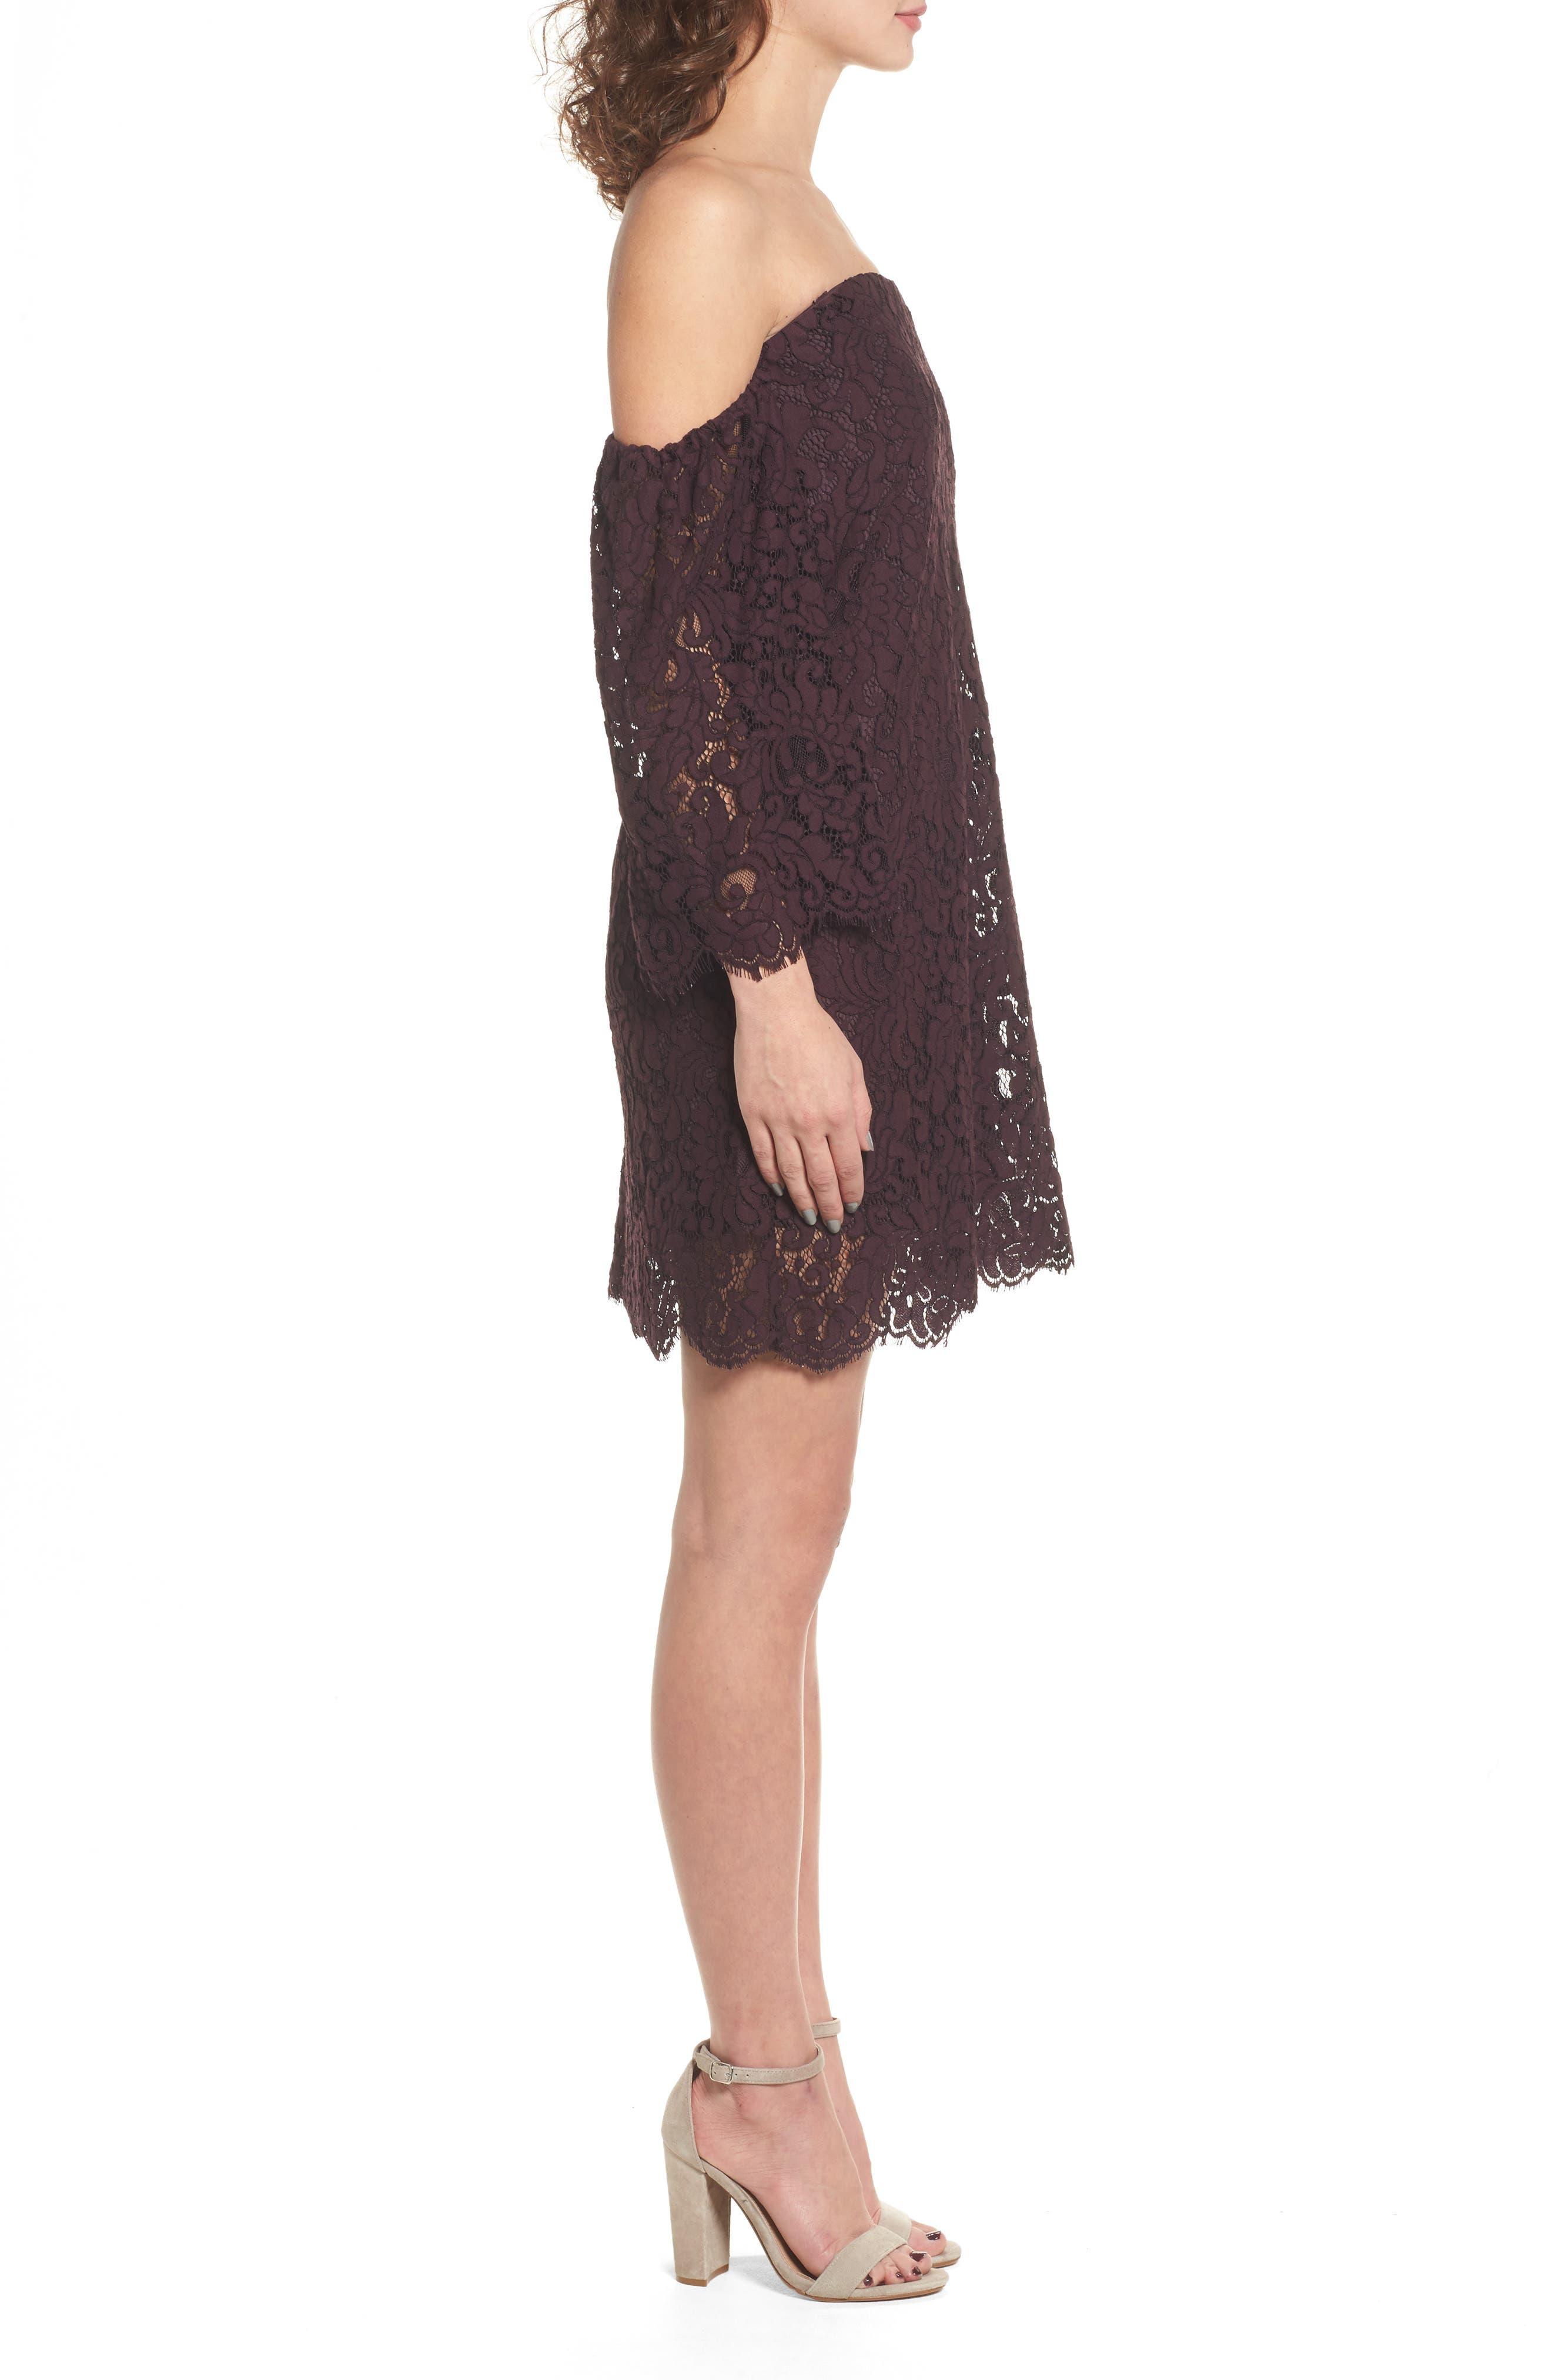 Adalira Off the Shoulder Lace Dress,                             Alternate thumbnail 3, color,                             930